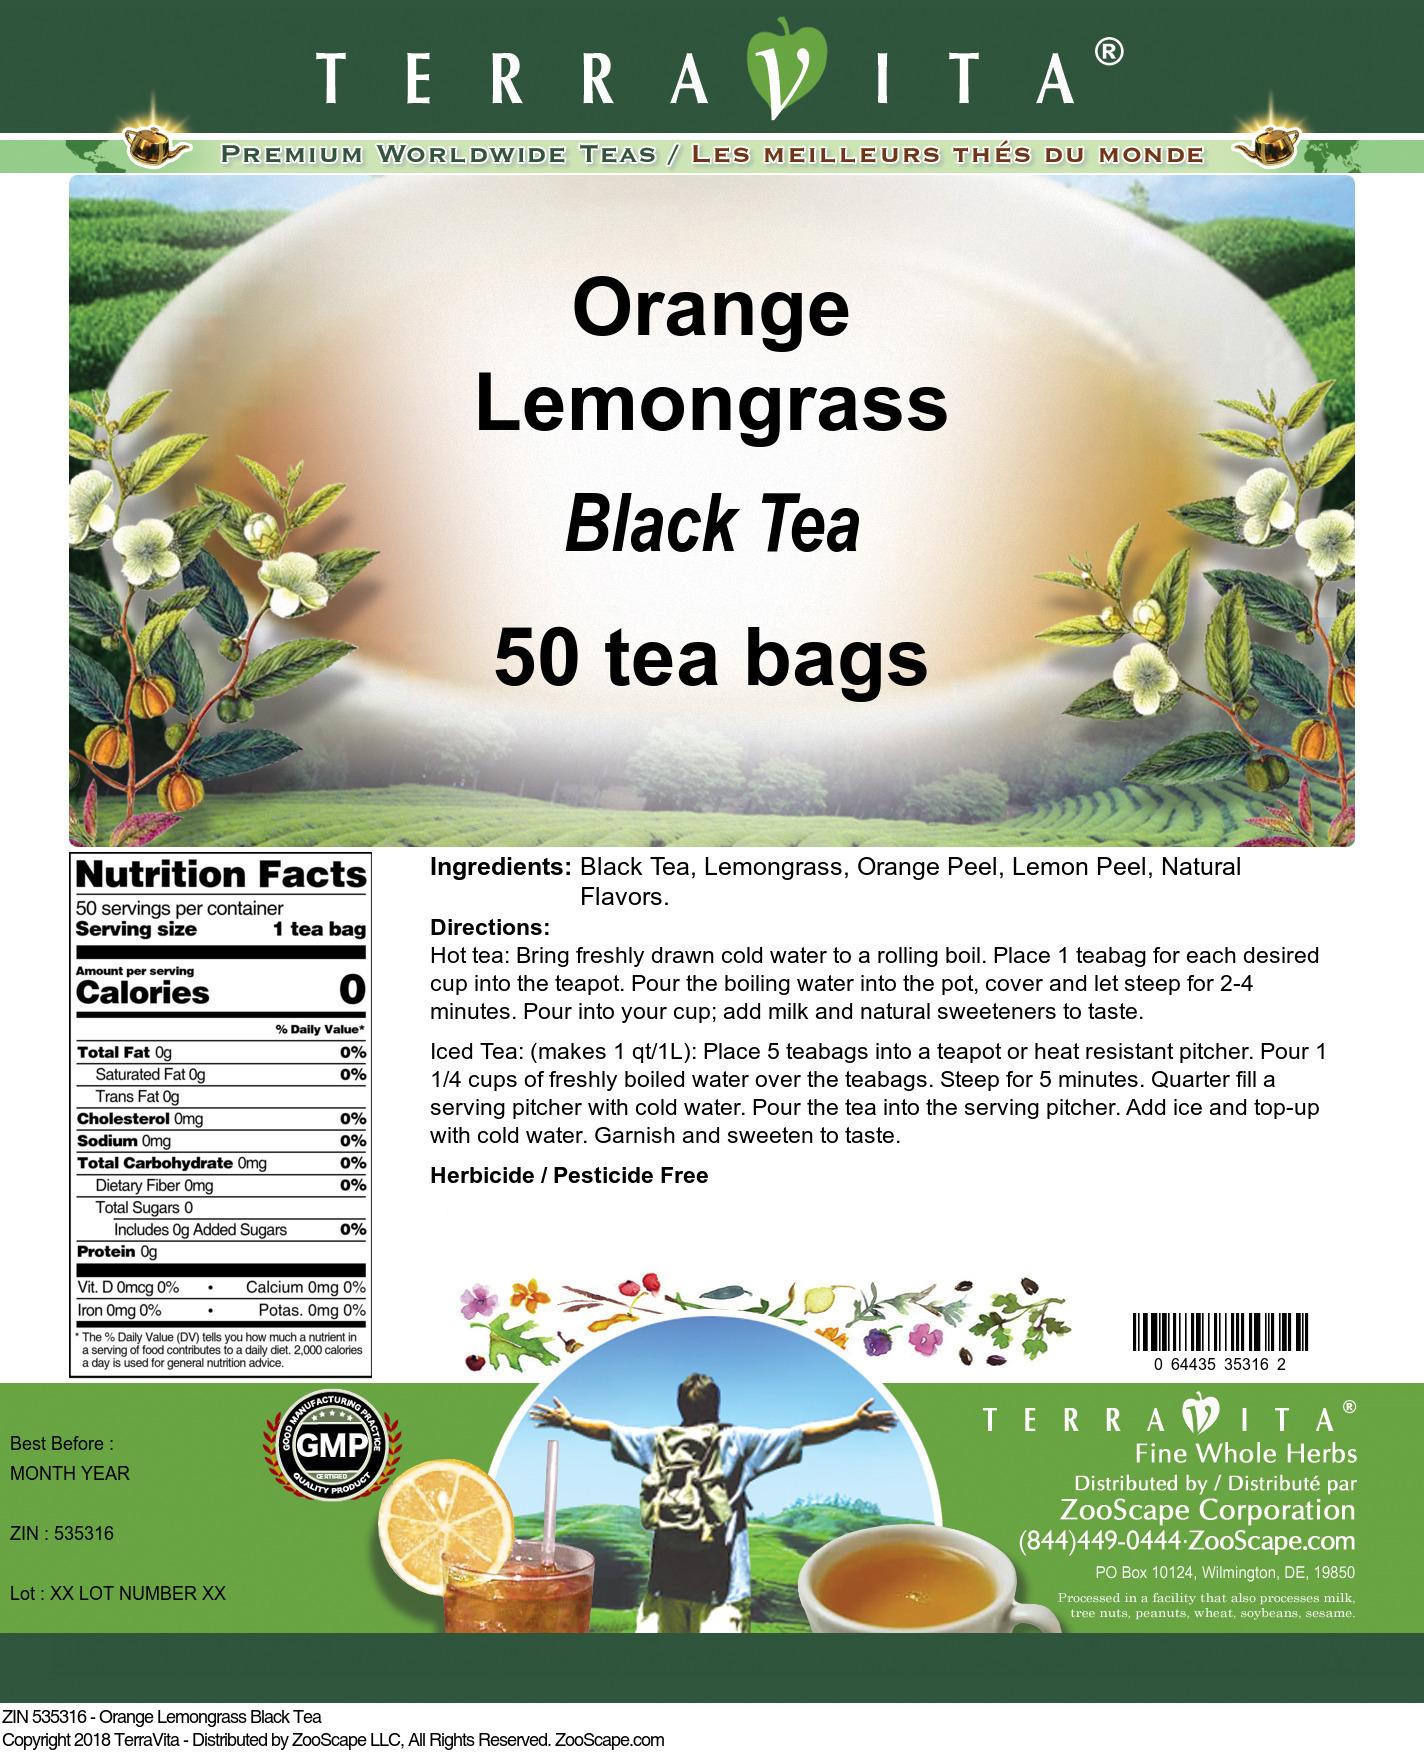 Orange Lemongrass Black Tea